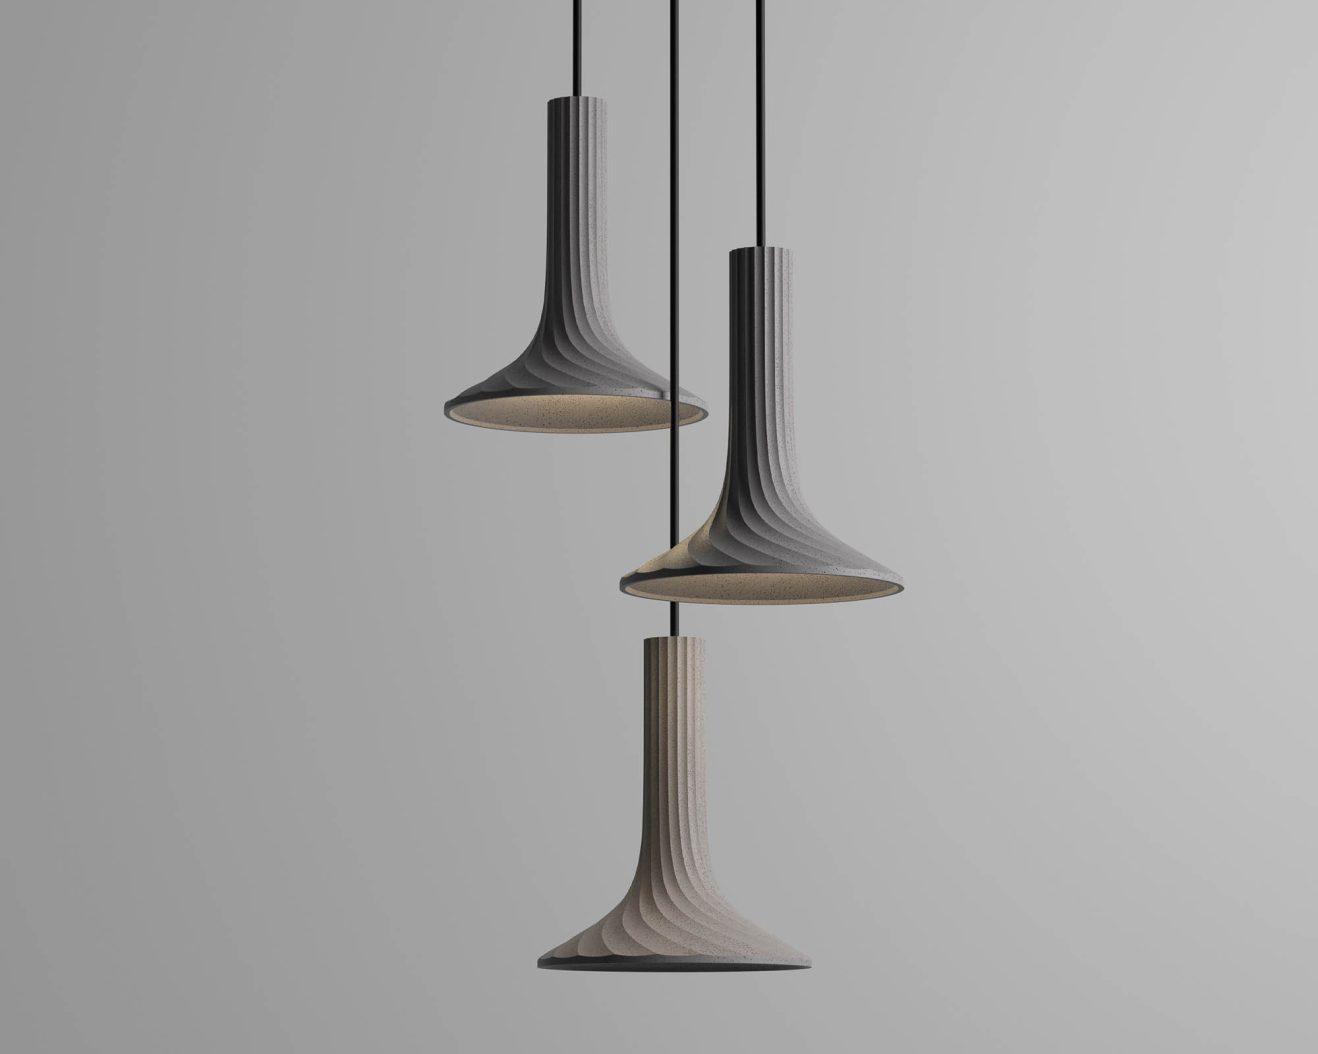 Xuan-BentuDesign-pendantlamp2